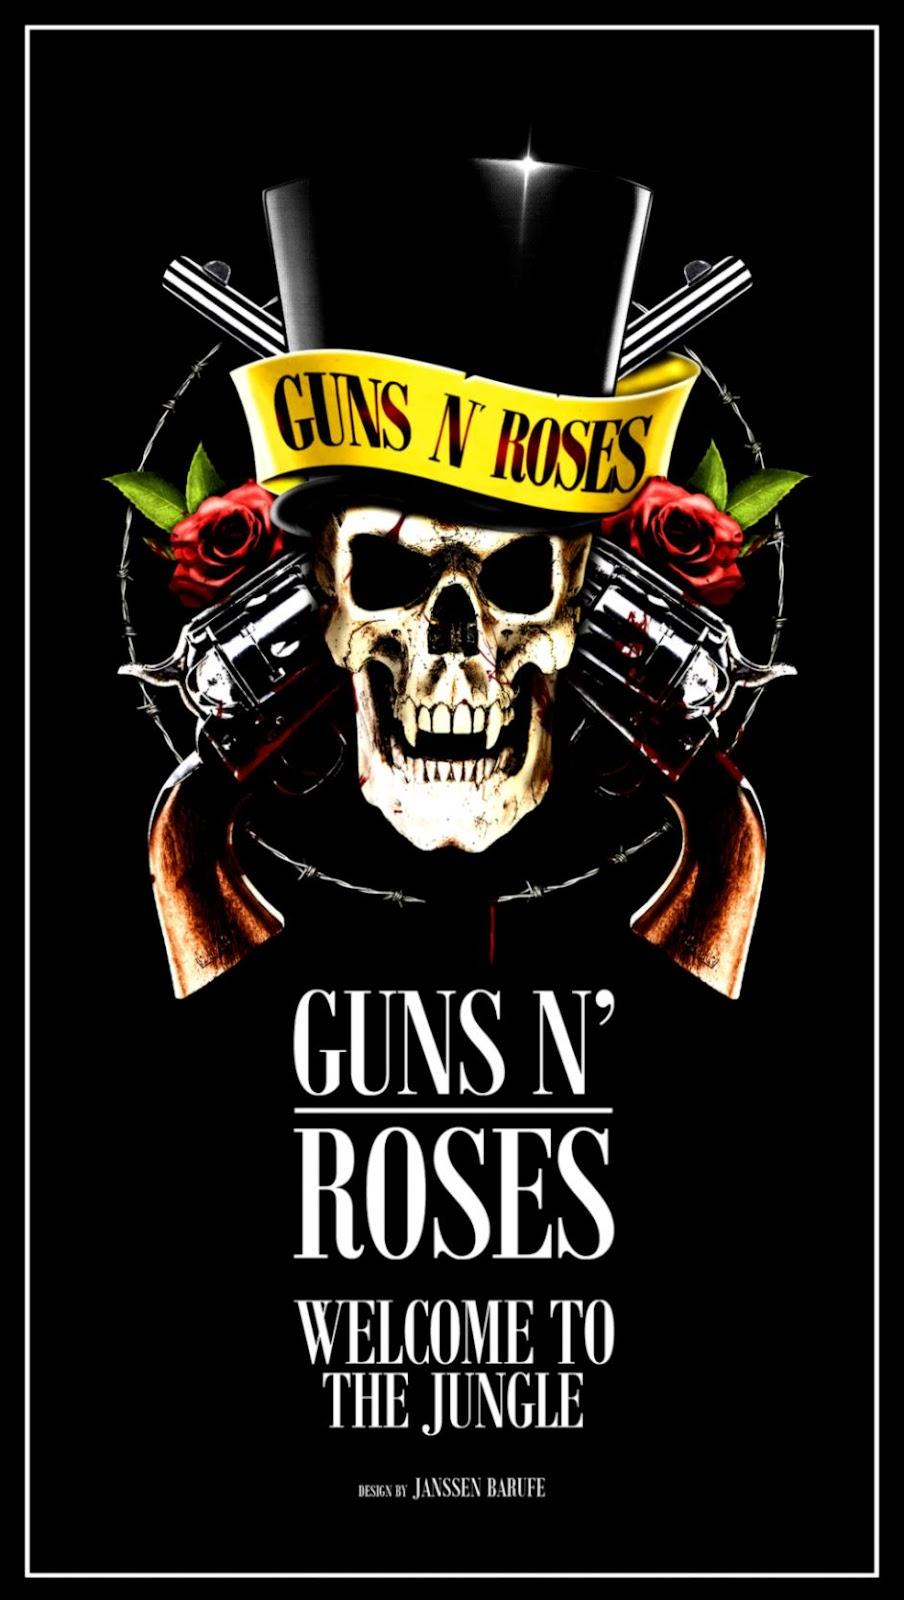 Download Wallpaper Guns N Roses Find Wallpapers